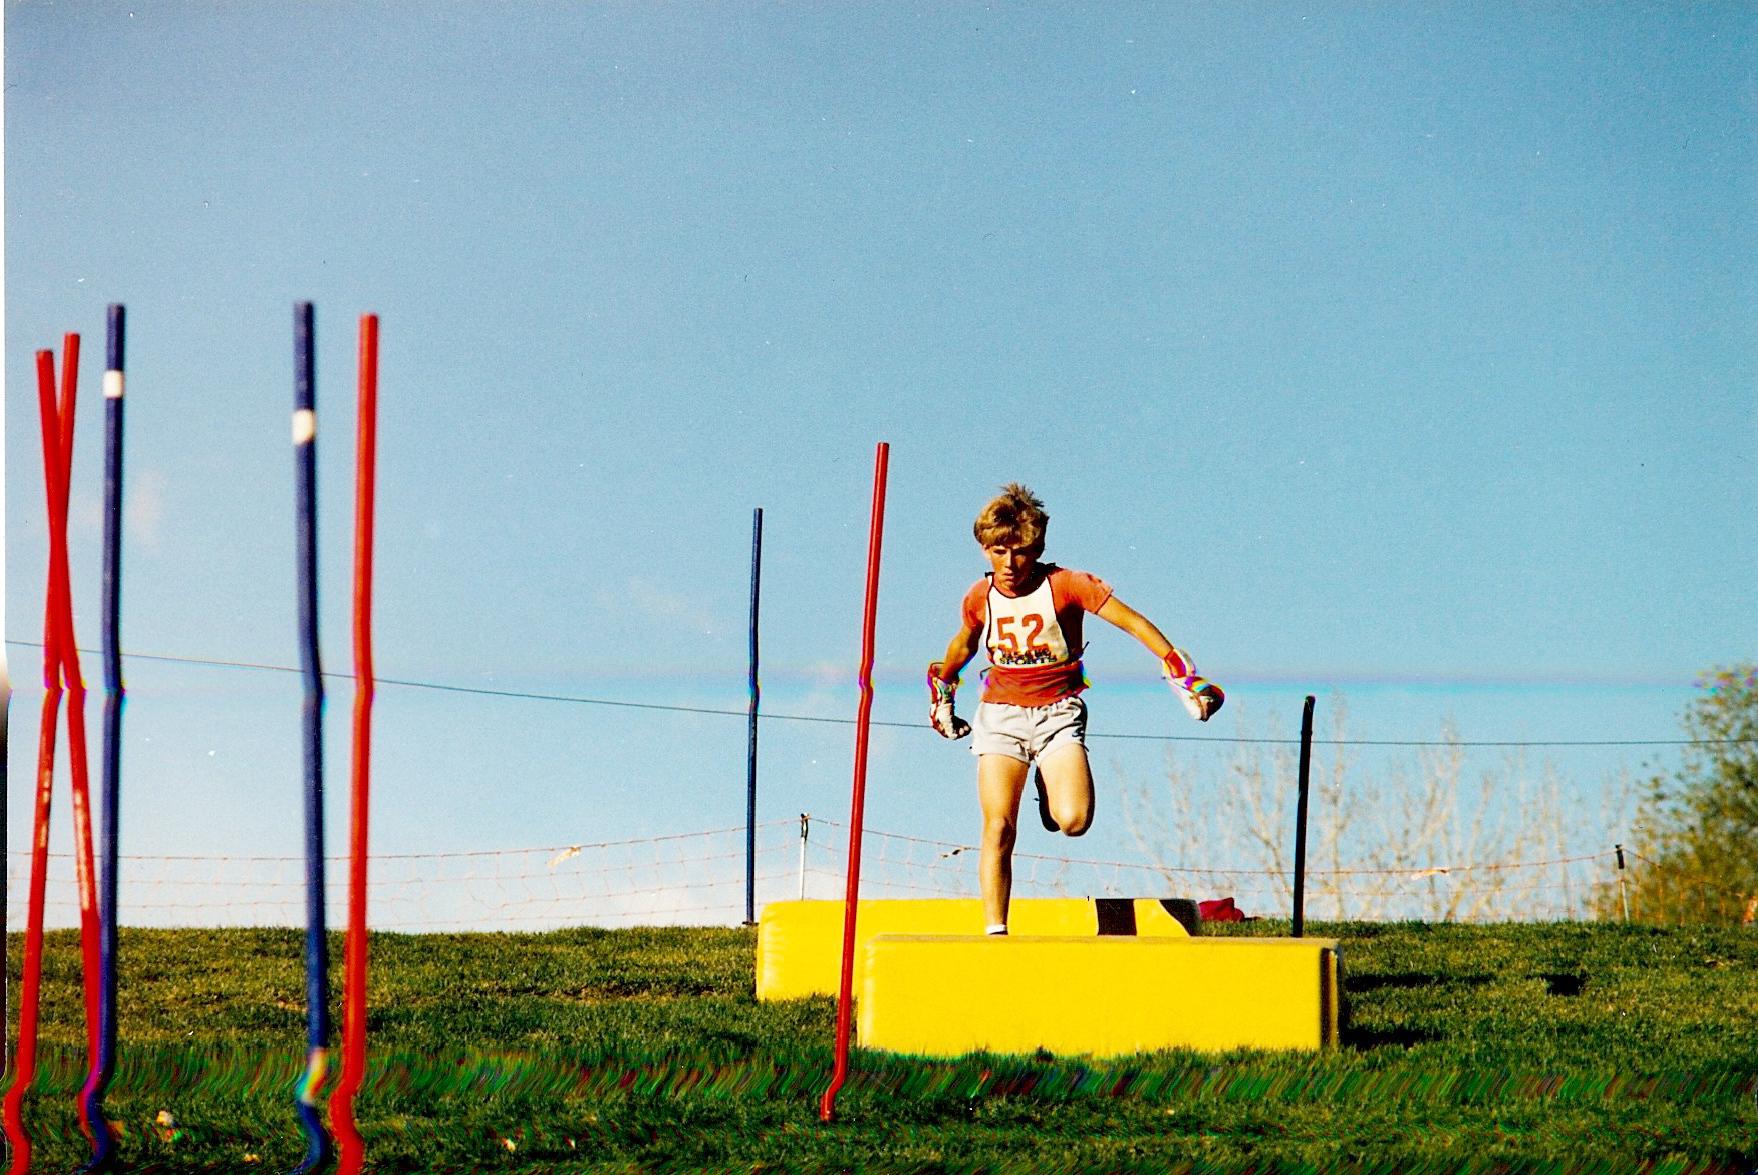 Sacha summer Olympic training